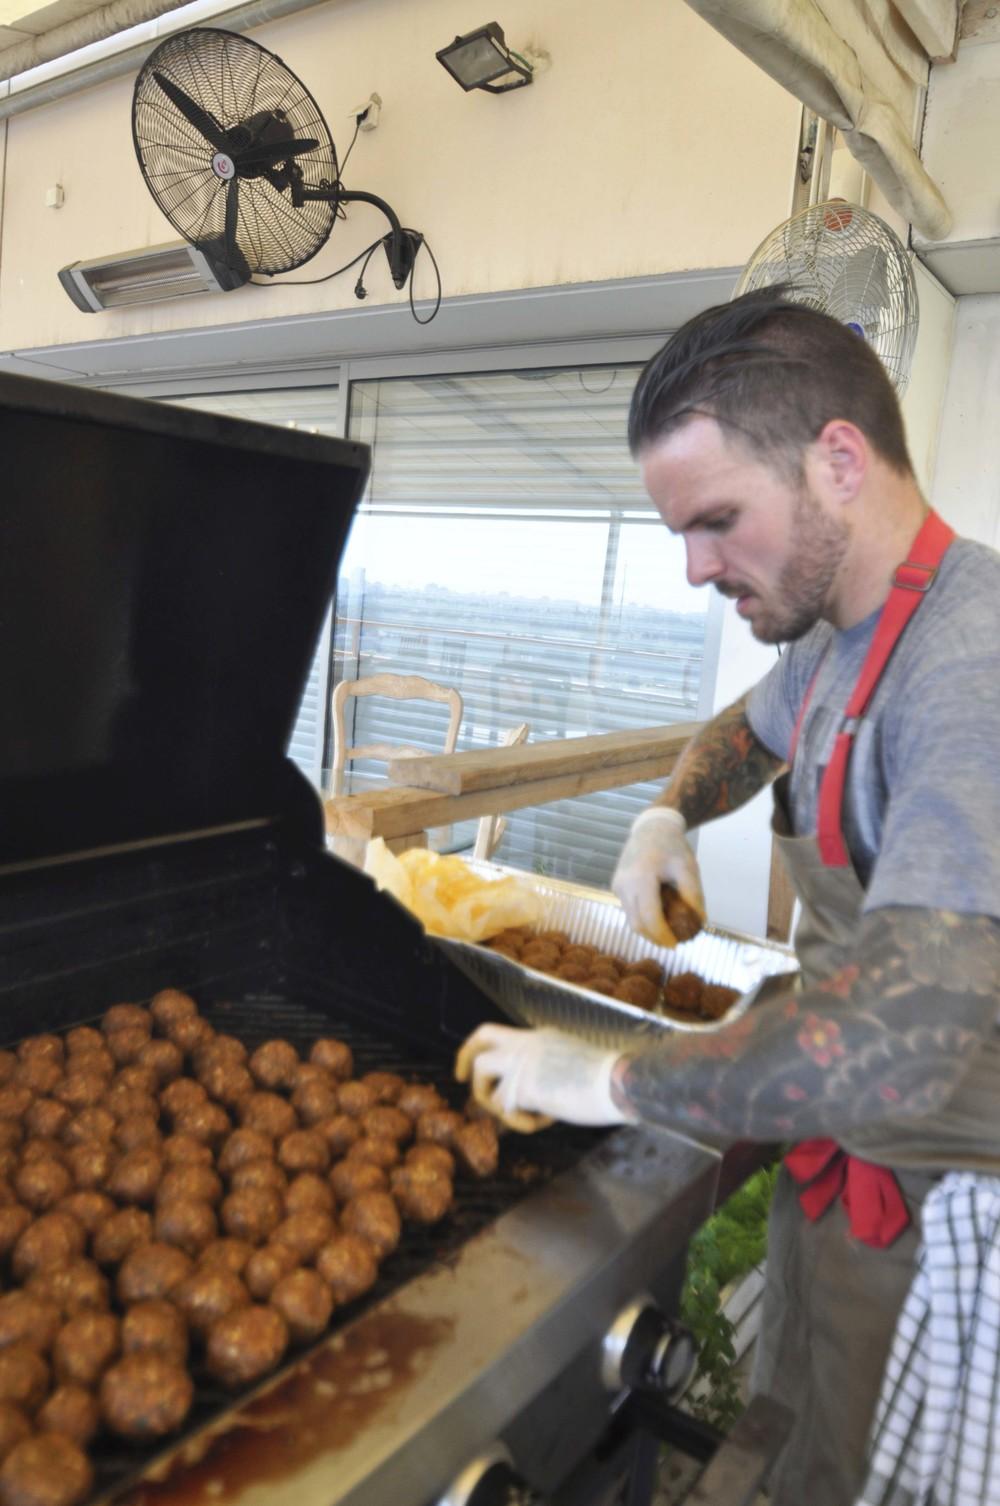 Nate Appleman Grilling Meatballs in Tel Aviv, Israel